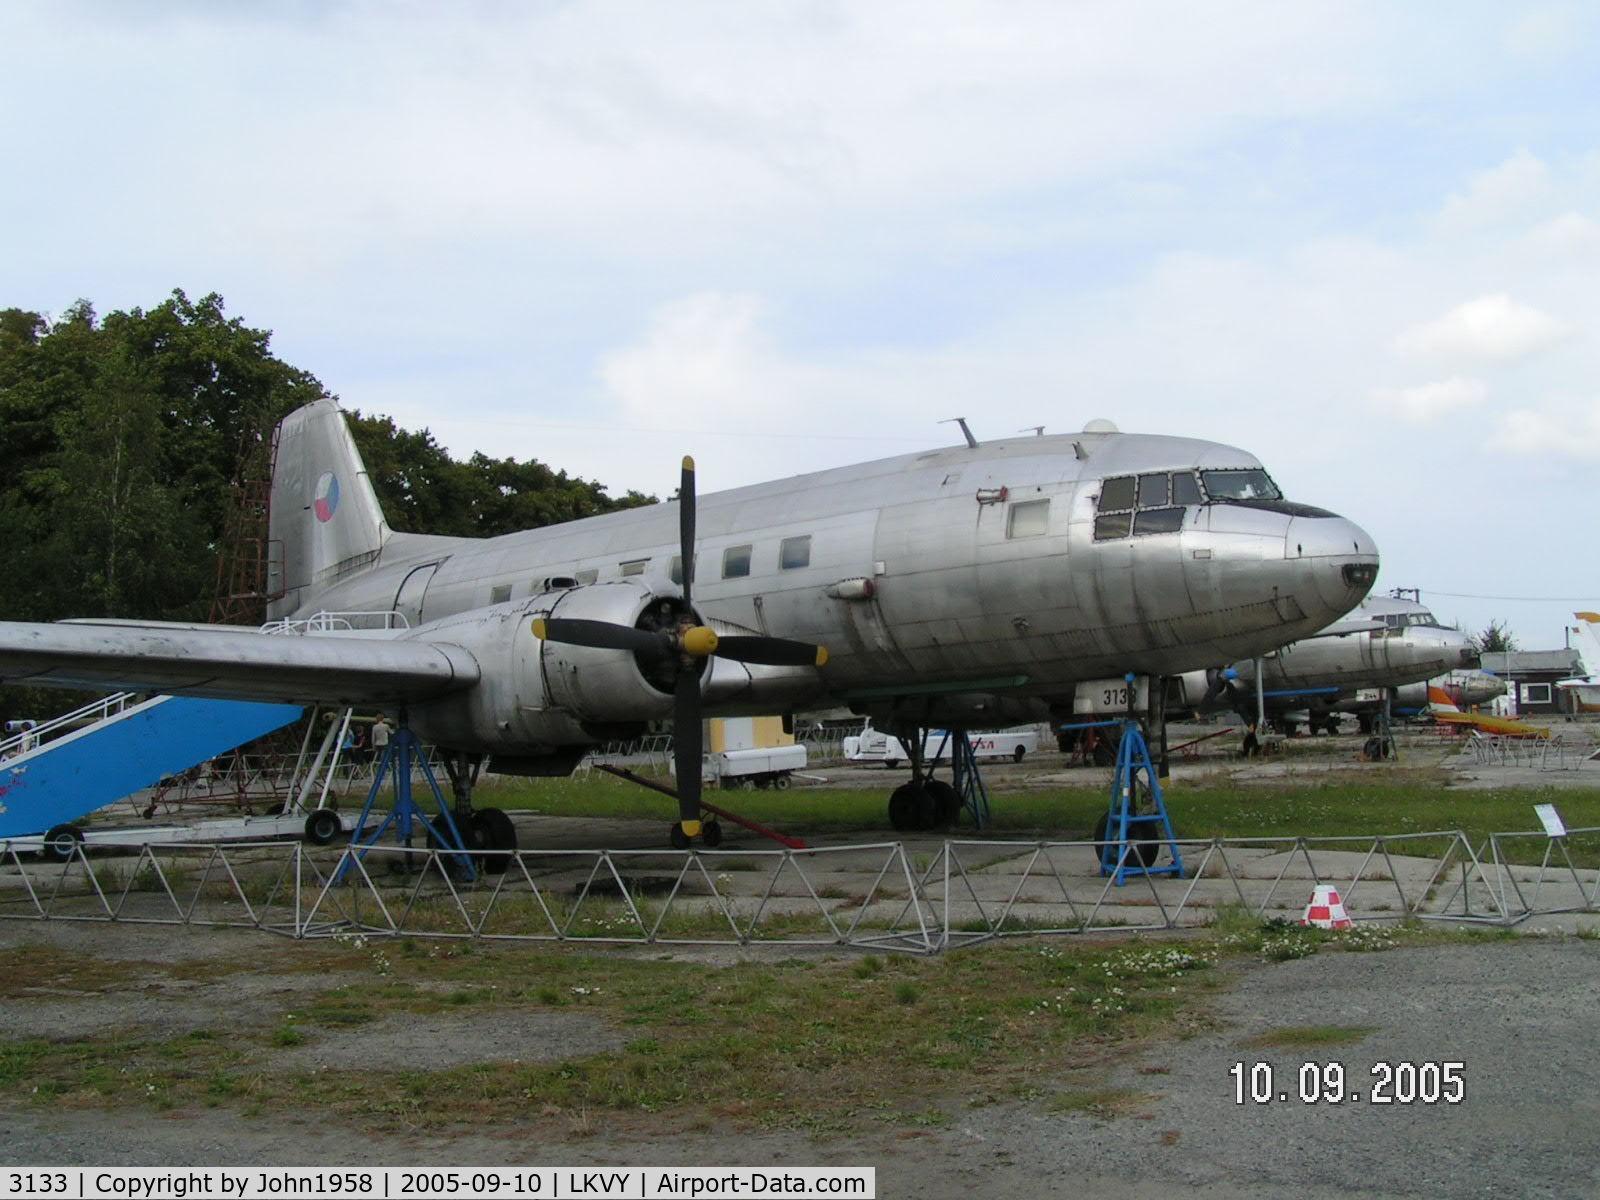 3133, Avia Av-14R C/N 156913133, Ilyushin IL-14